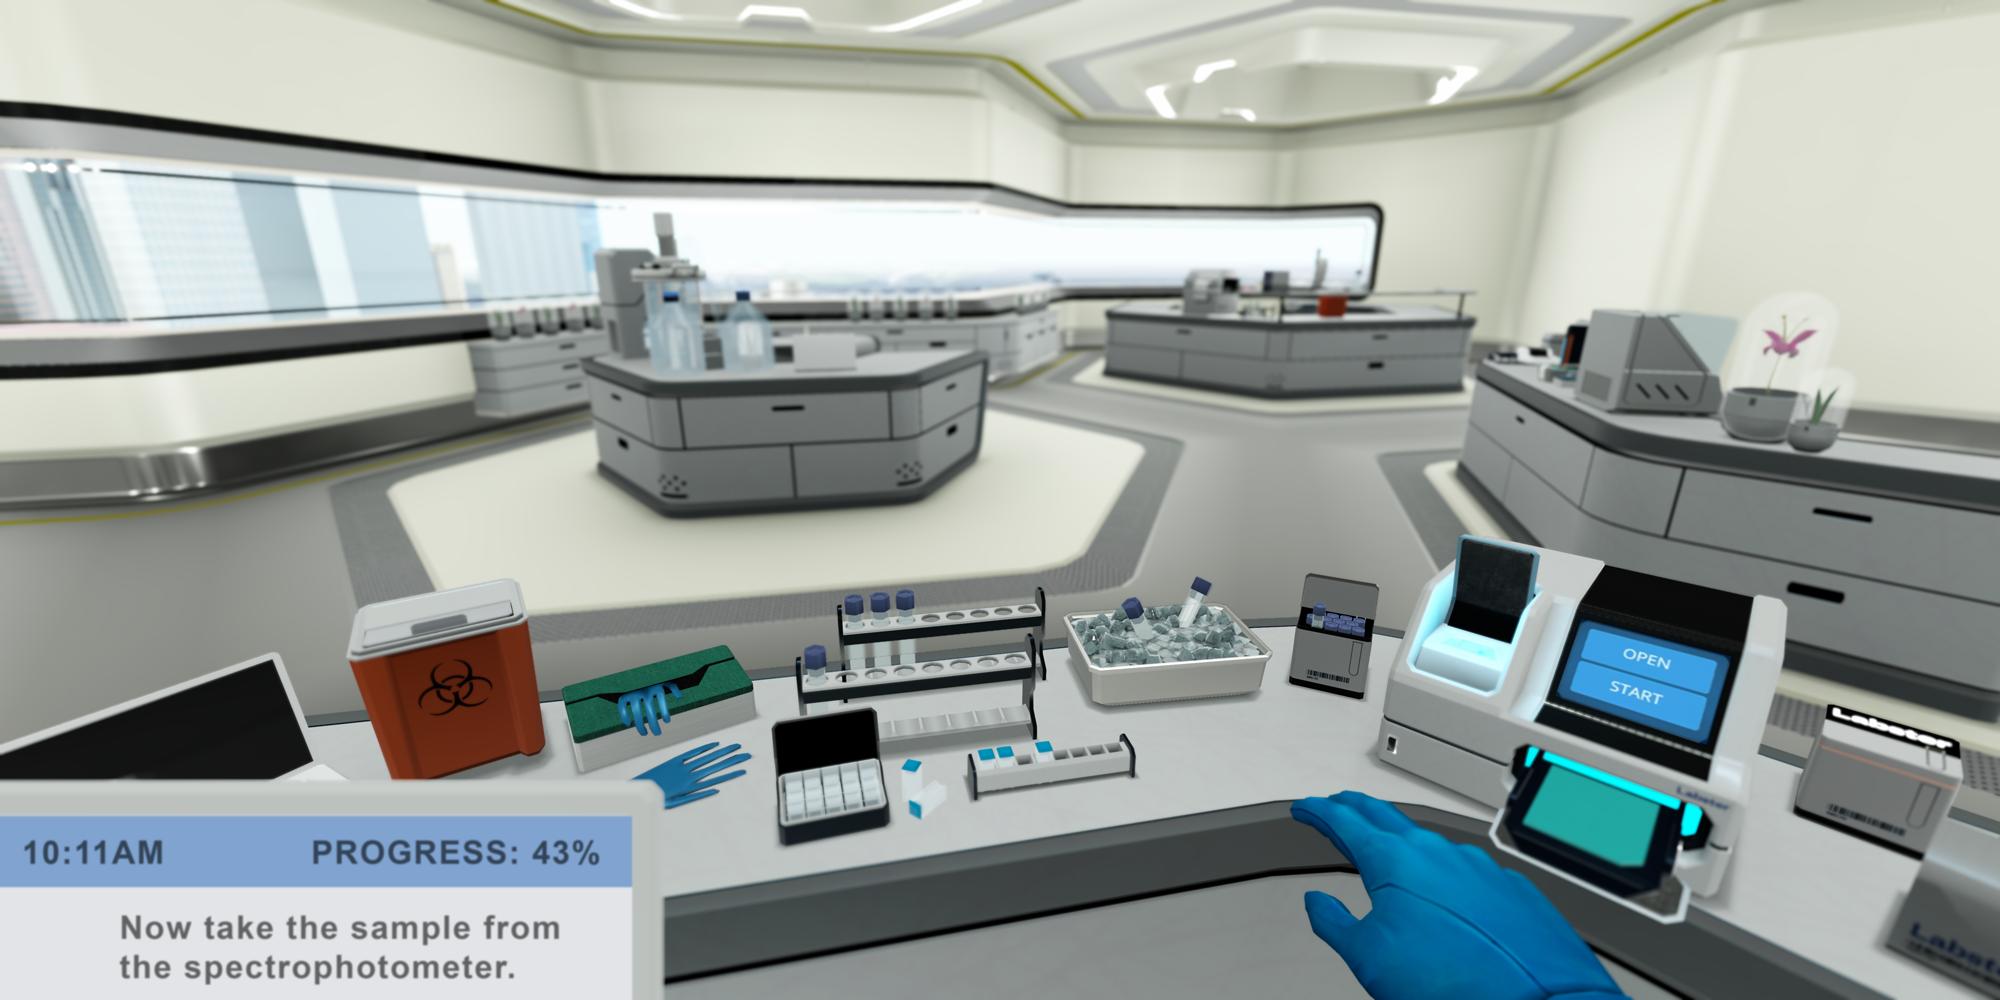 techcrunch.com - Steve O'Hear - Labster scores $21M Series B to bring VR to STEM education